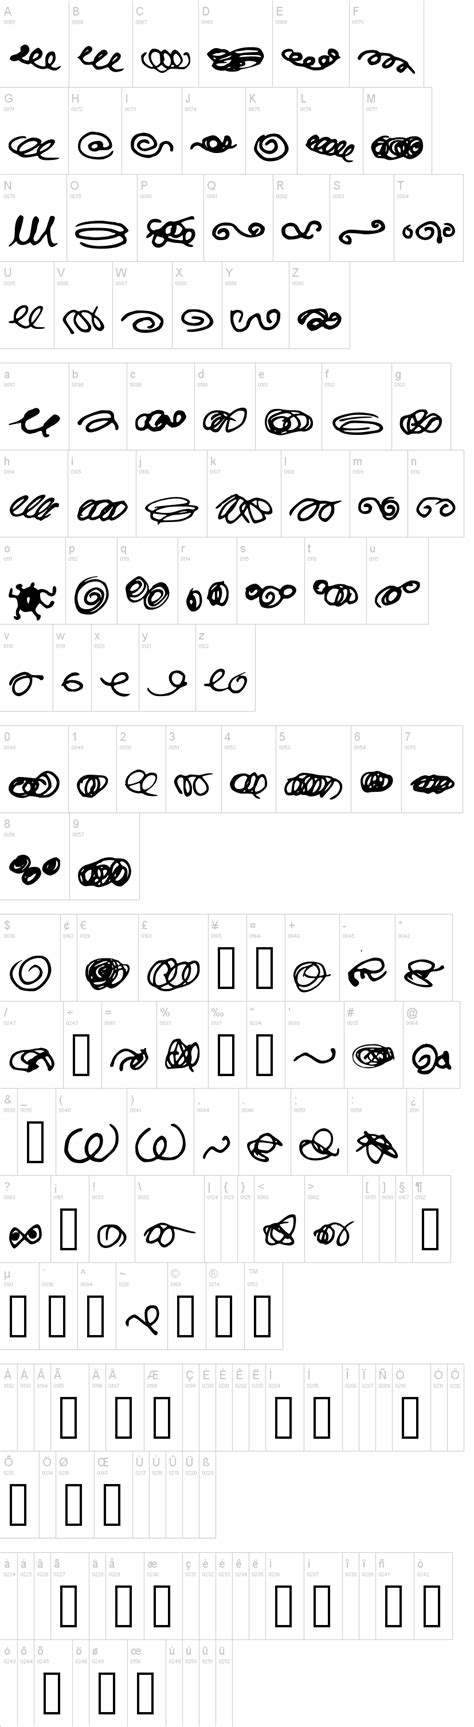 dafont font finder random swirls font dafont com